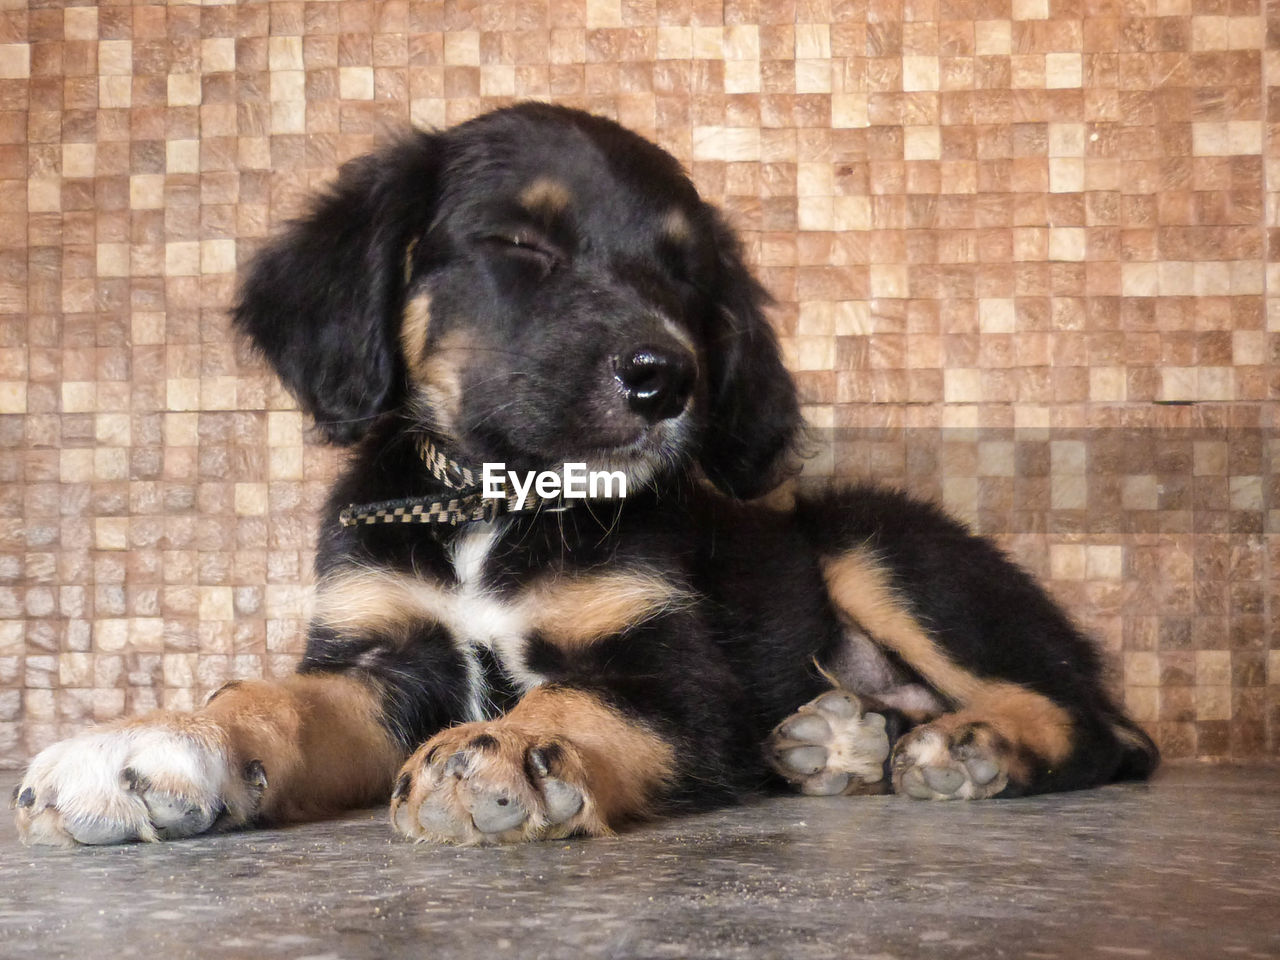 Puppy sleeping against wall